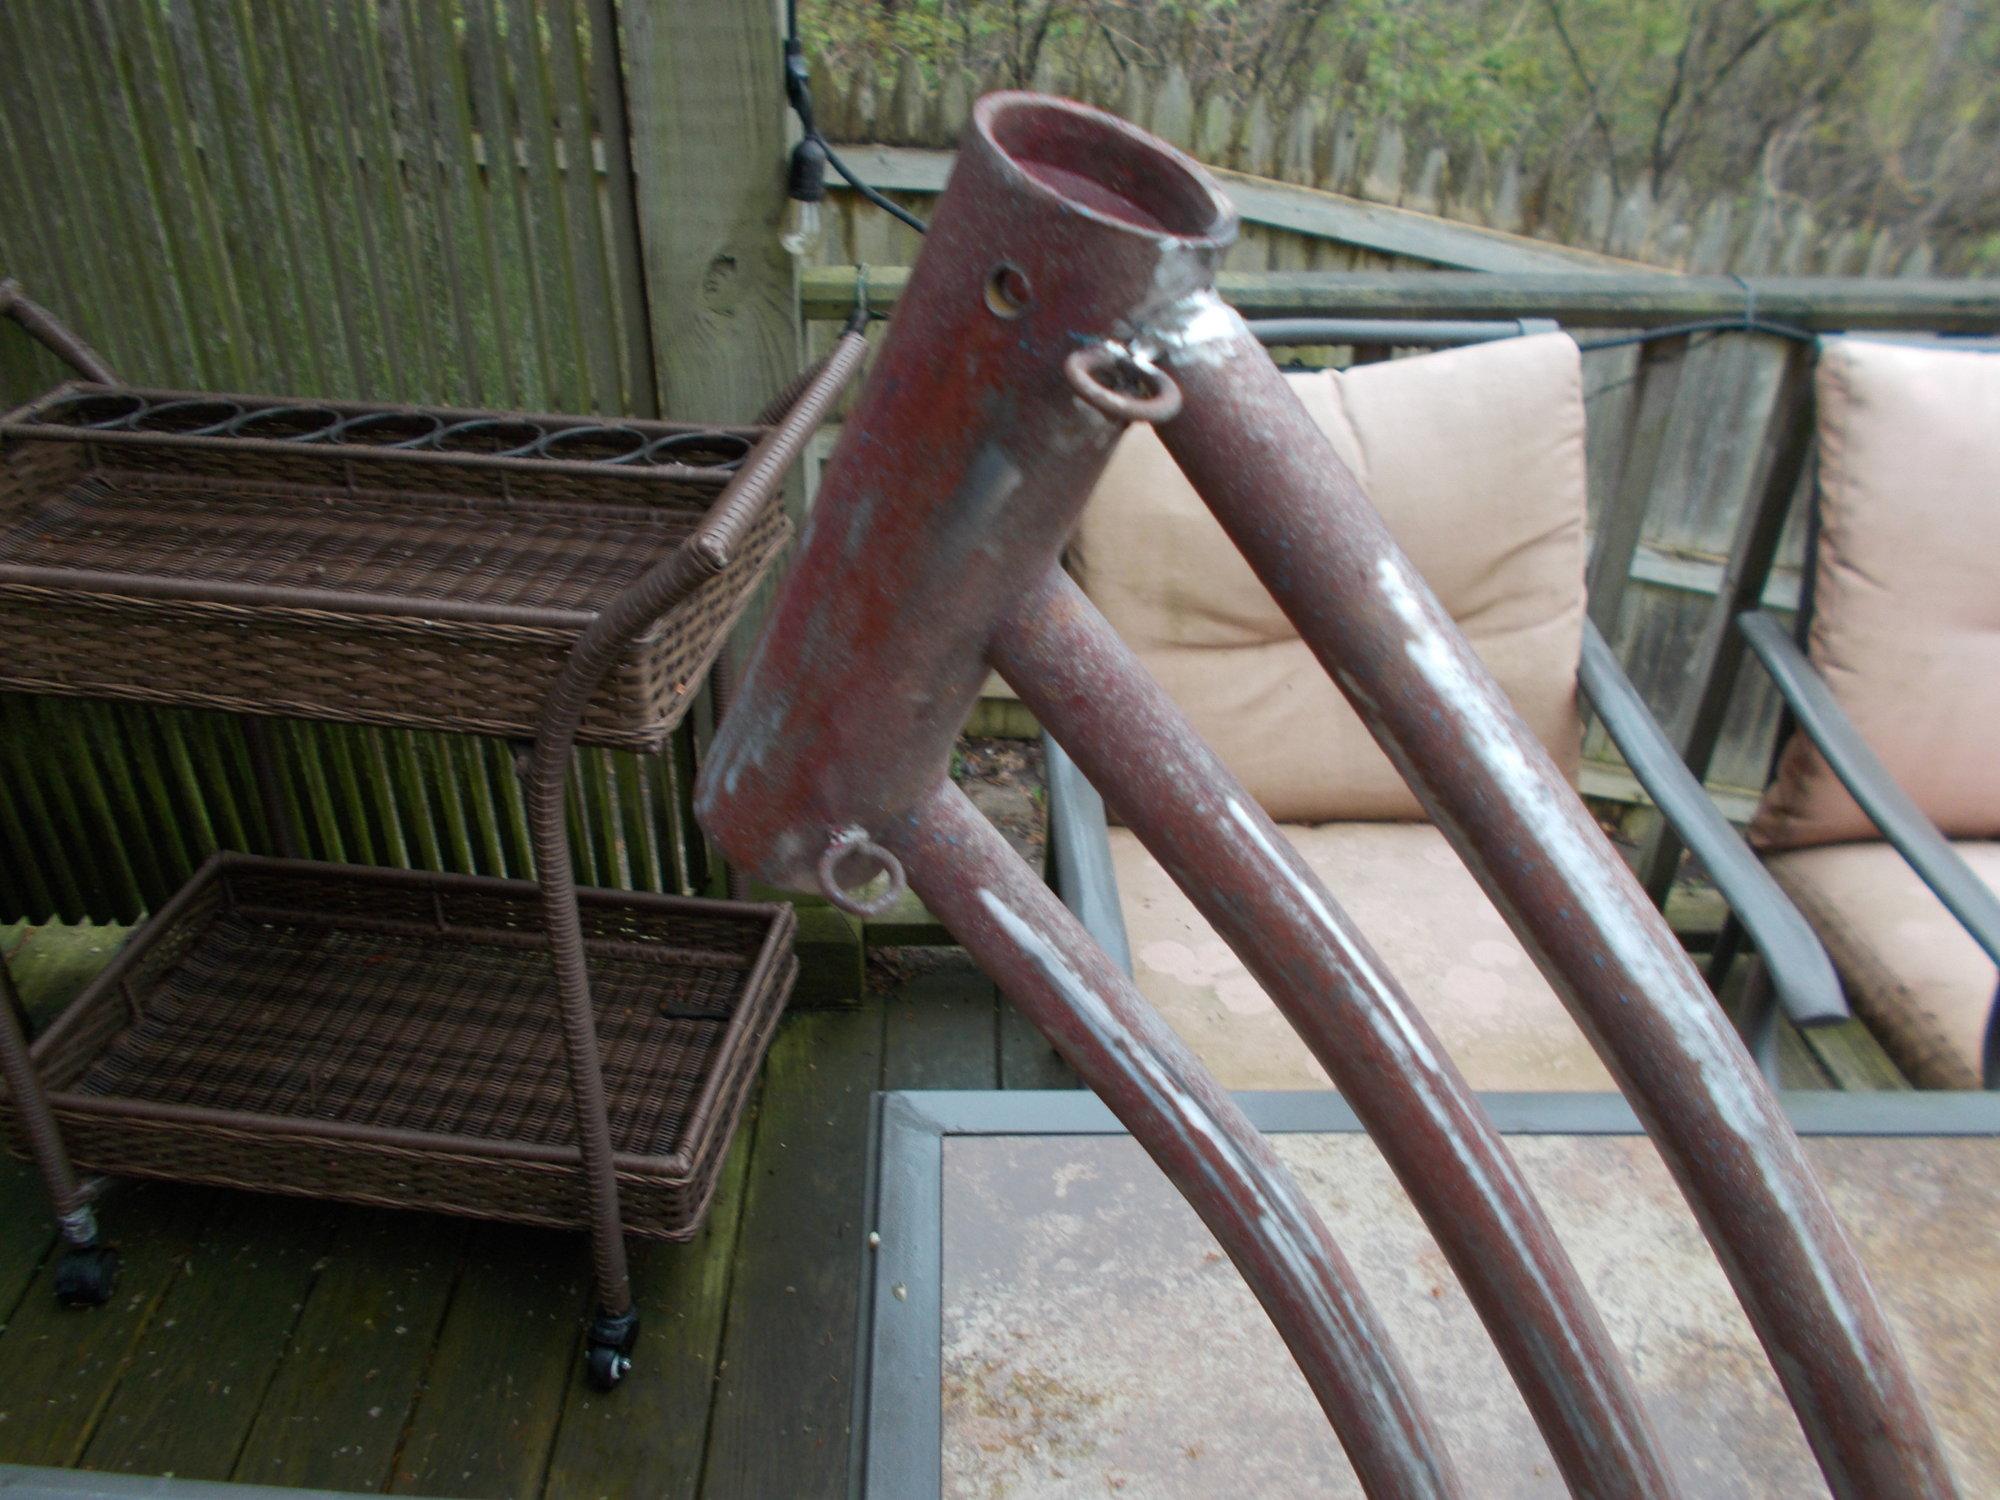 cabe swap meet parts for sale 022.JPG